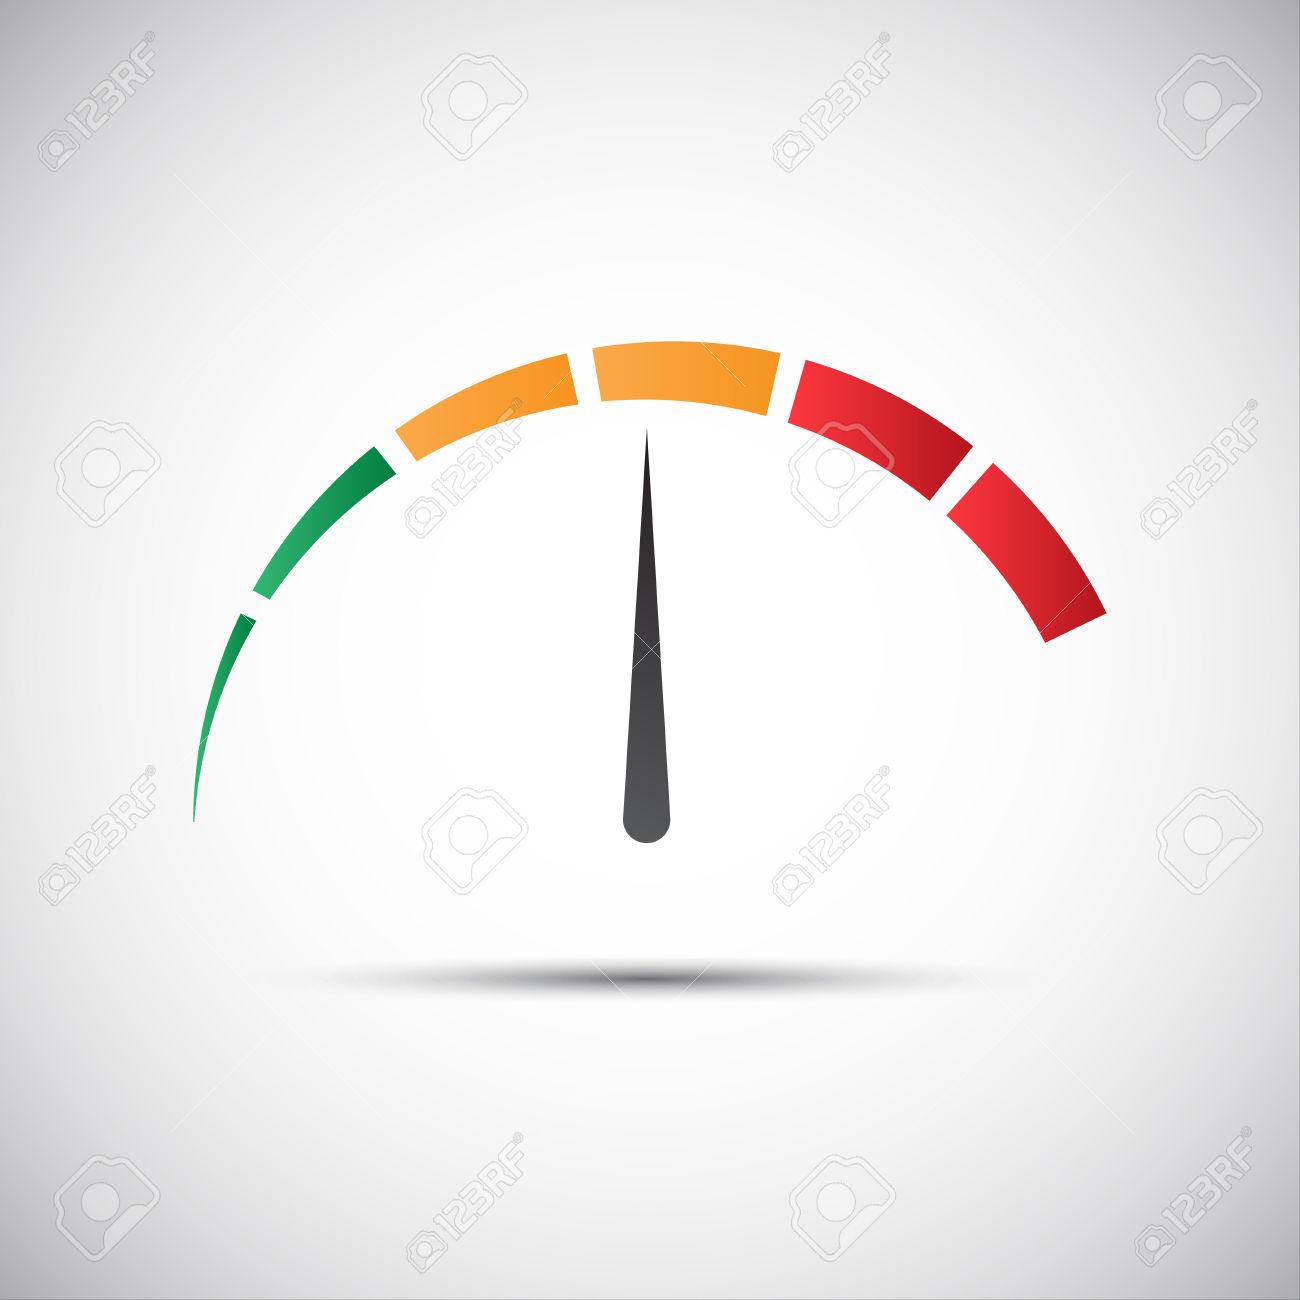 Simple Tachometer With Indicator In Orange Part, Speed Meter.